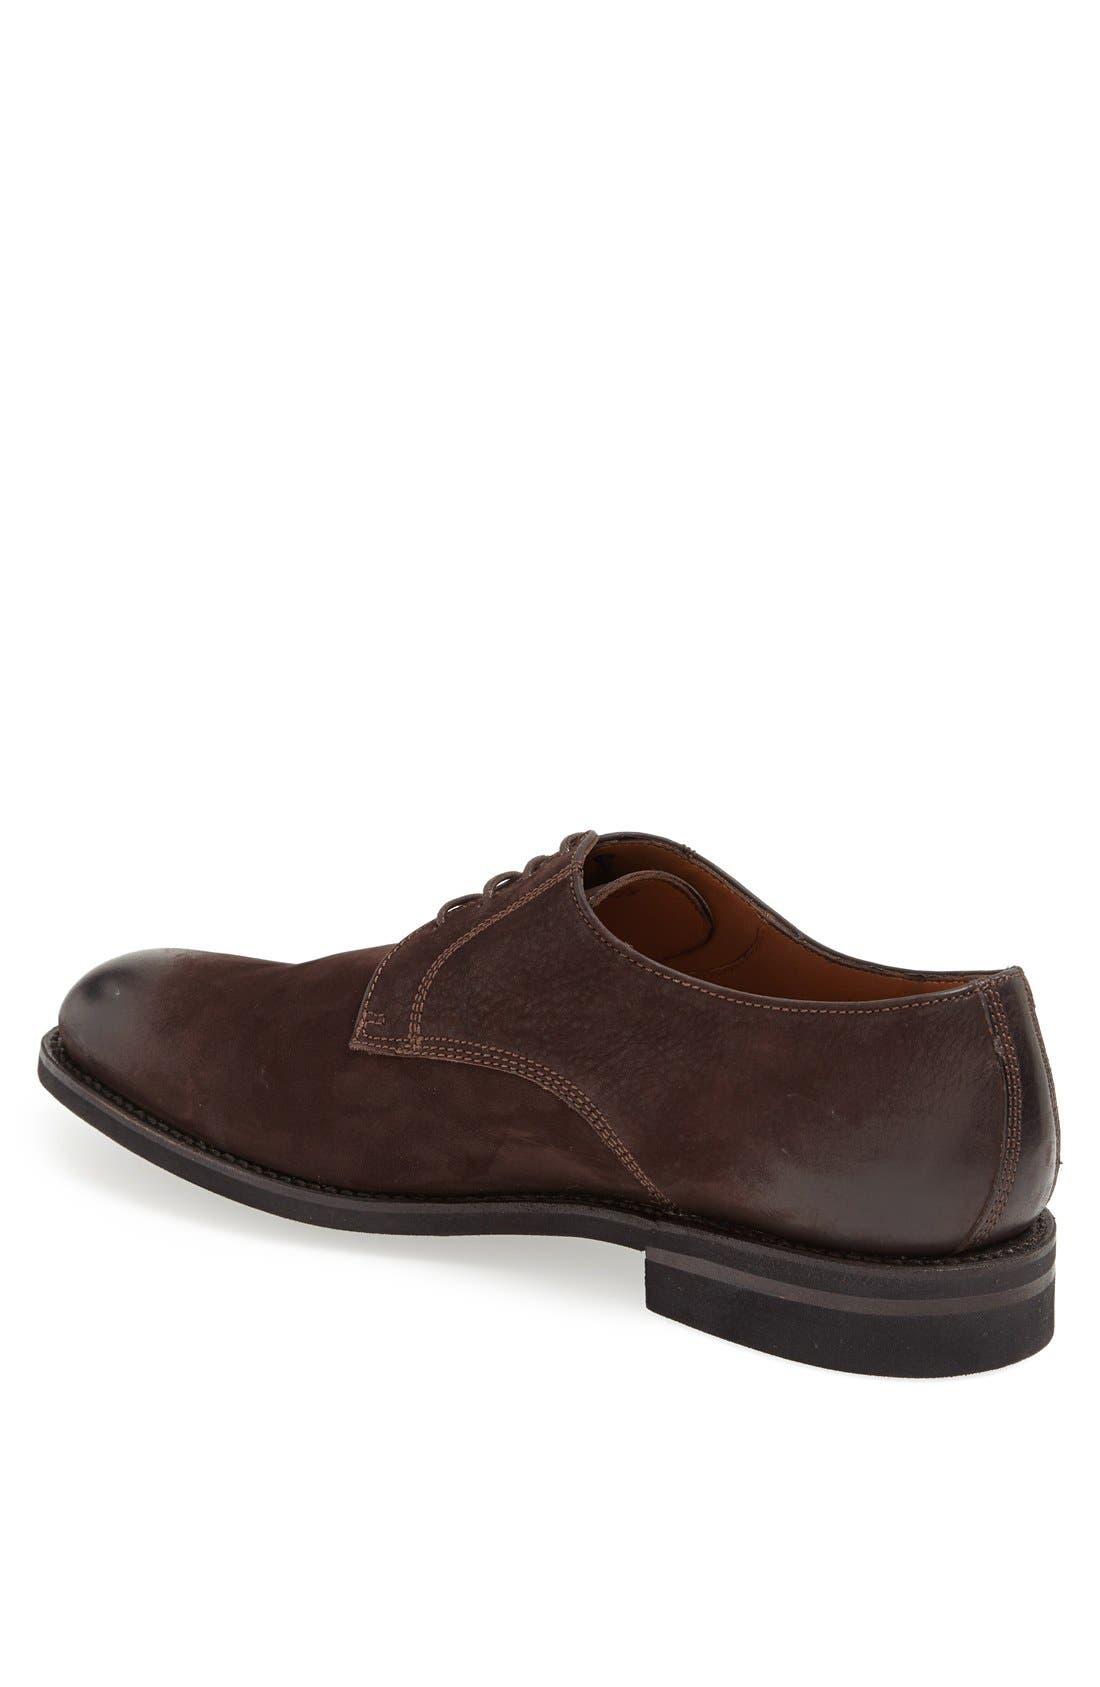 Alternate Image 2  - Lottusse Leather Plain Toe Derby